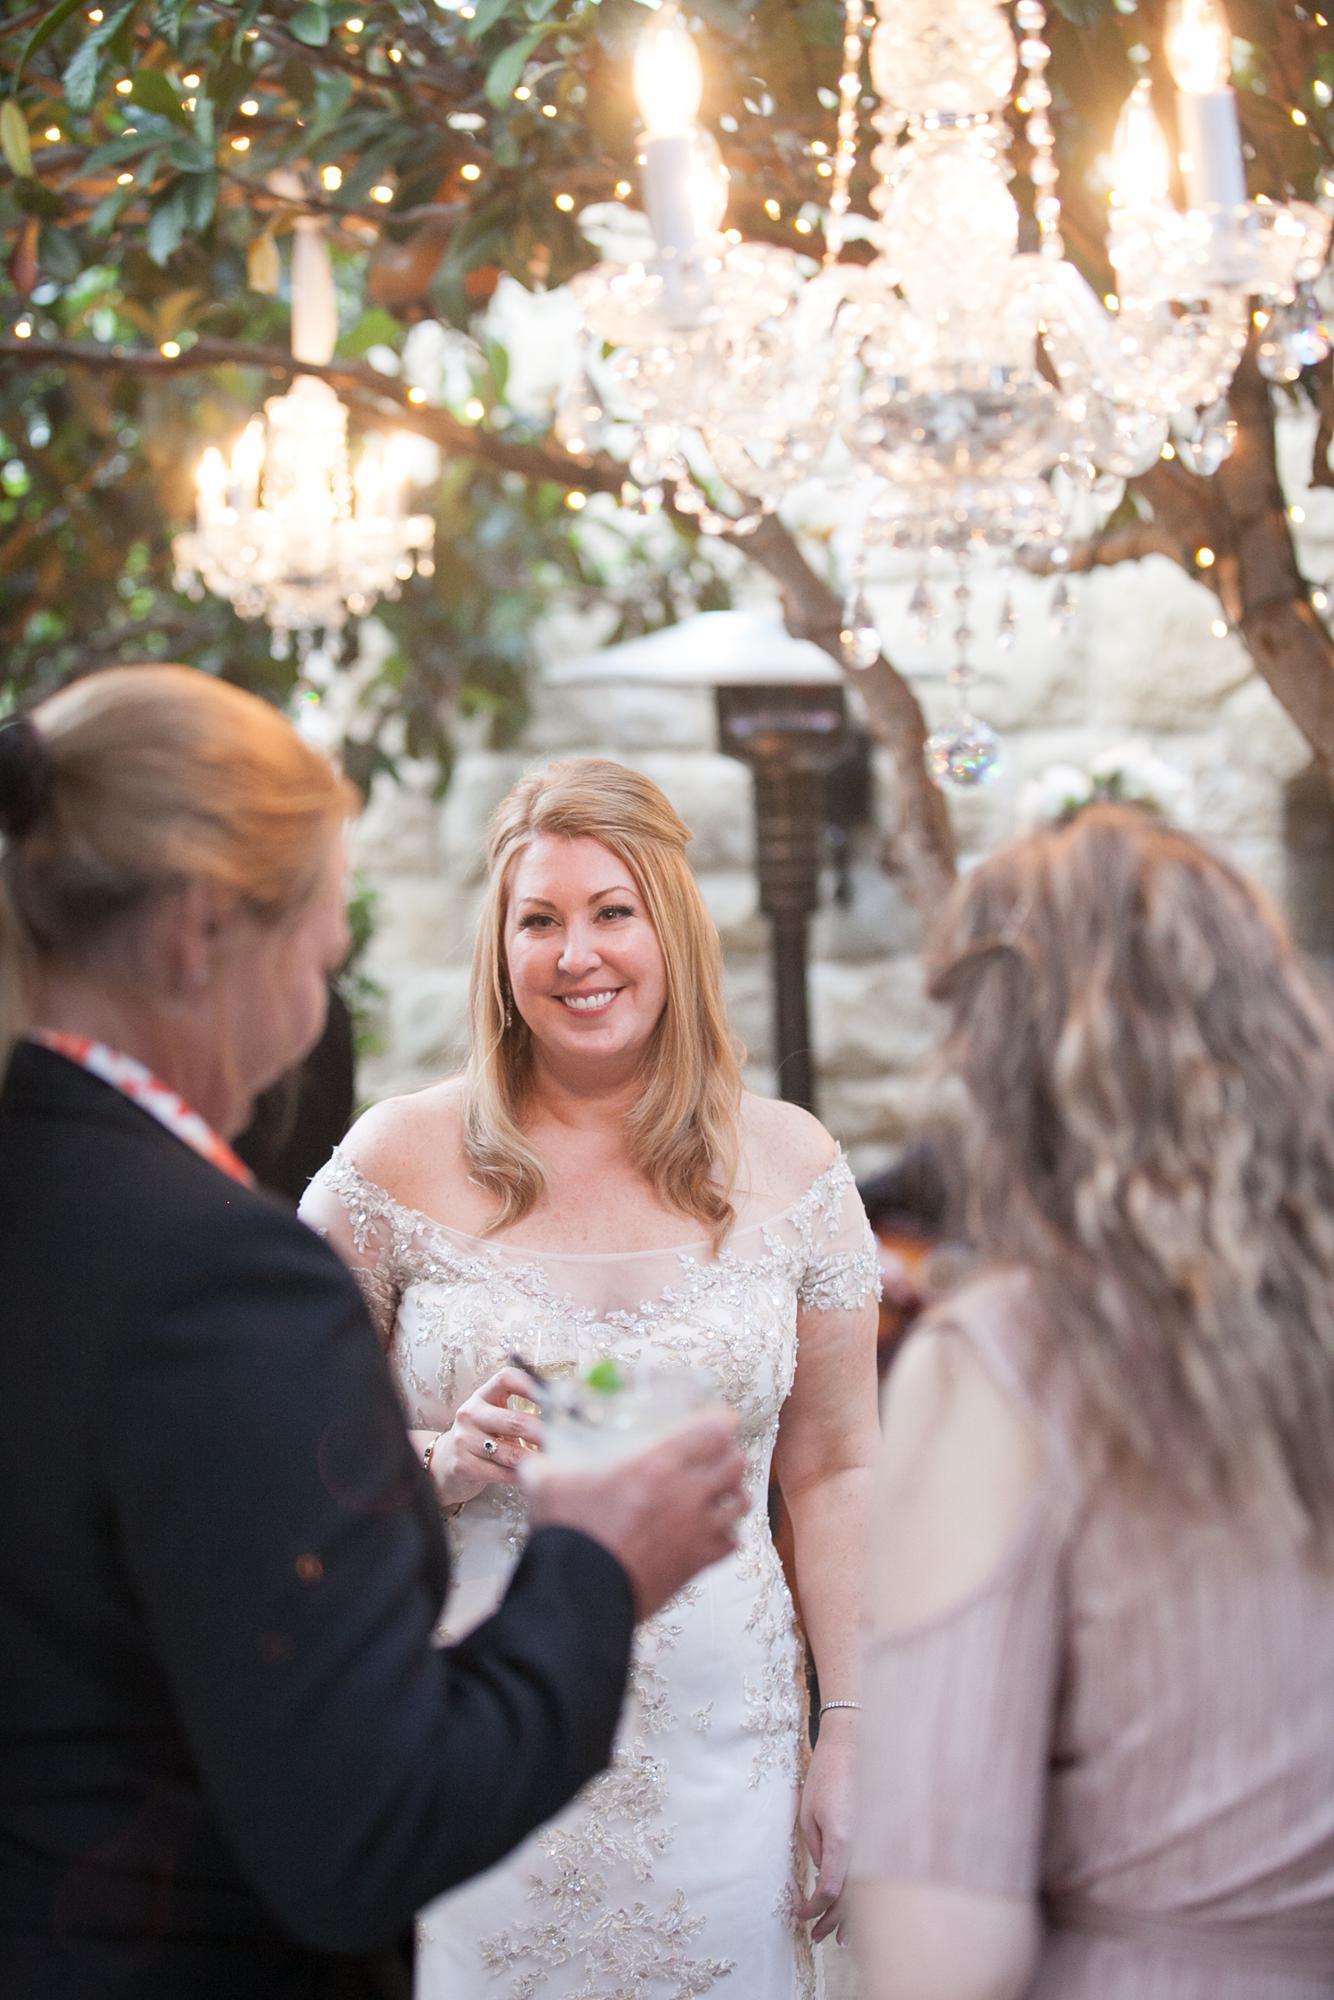 San Ysidro Ranch Wedding   Miki & Sonja Photography   mikiandsonja.com